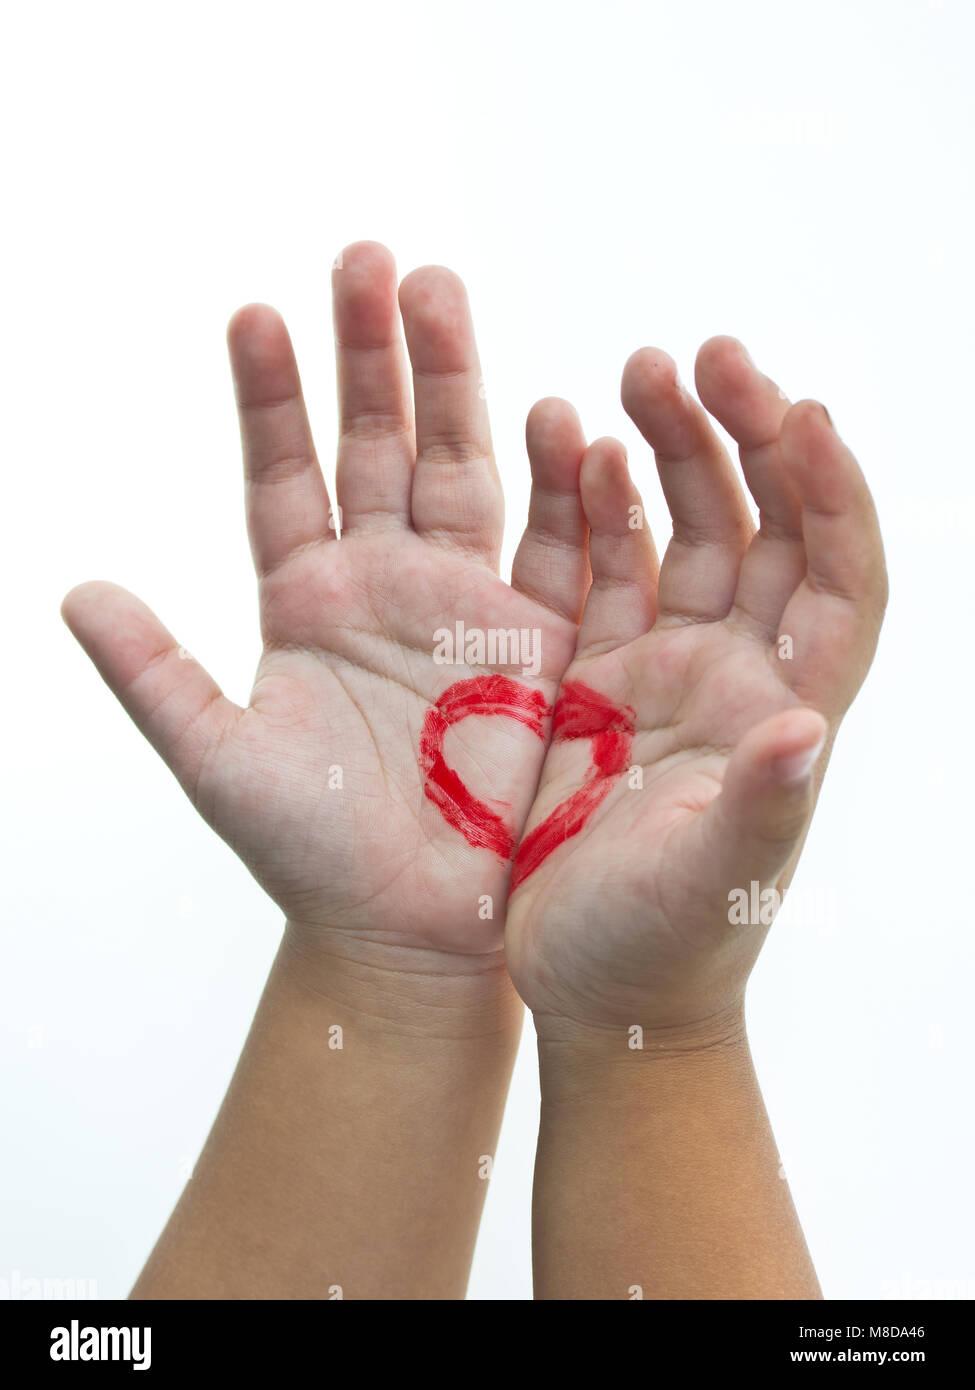 Corazón en las manos. Día de San Valentín, romance, amor, concepto Imagen De Stock